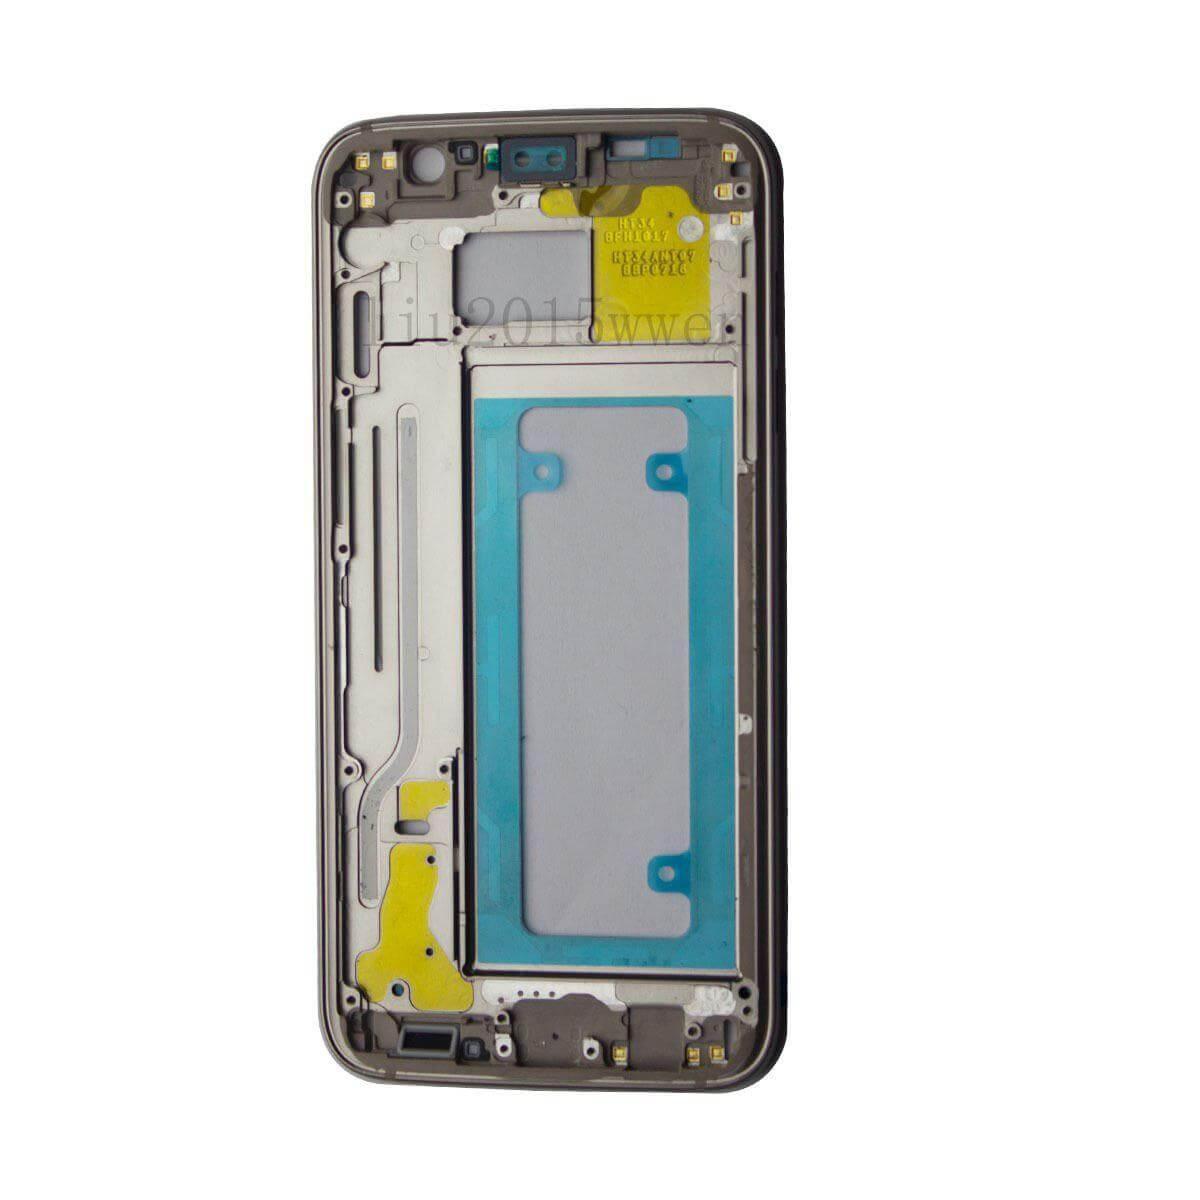 فلت-پاور-ولوم-گوشی-موبایل-گالکسی-اس-7-front-housing-lcd-frame-middle-5245.jpg